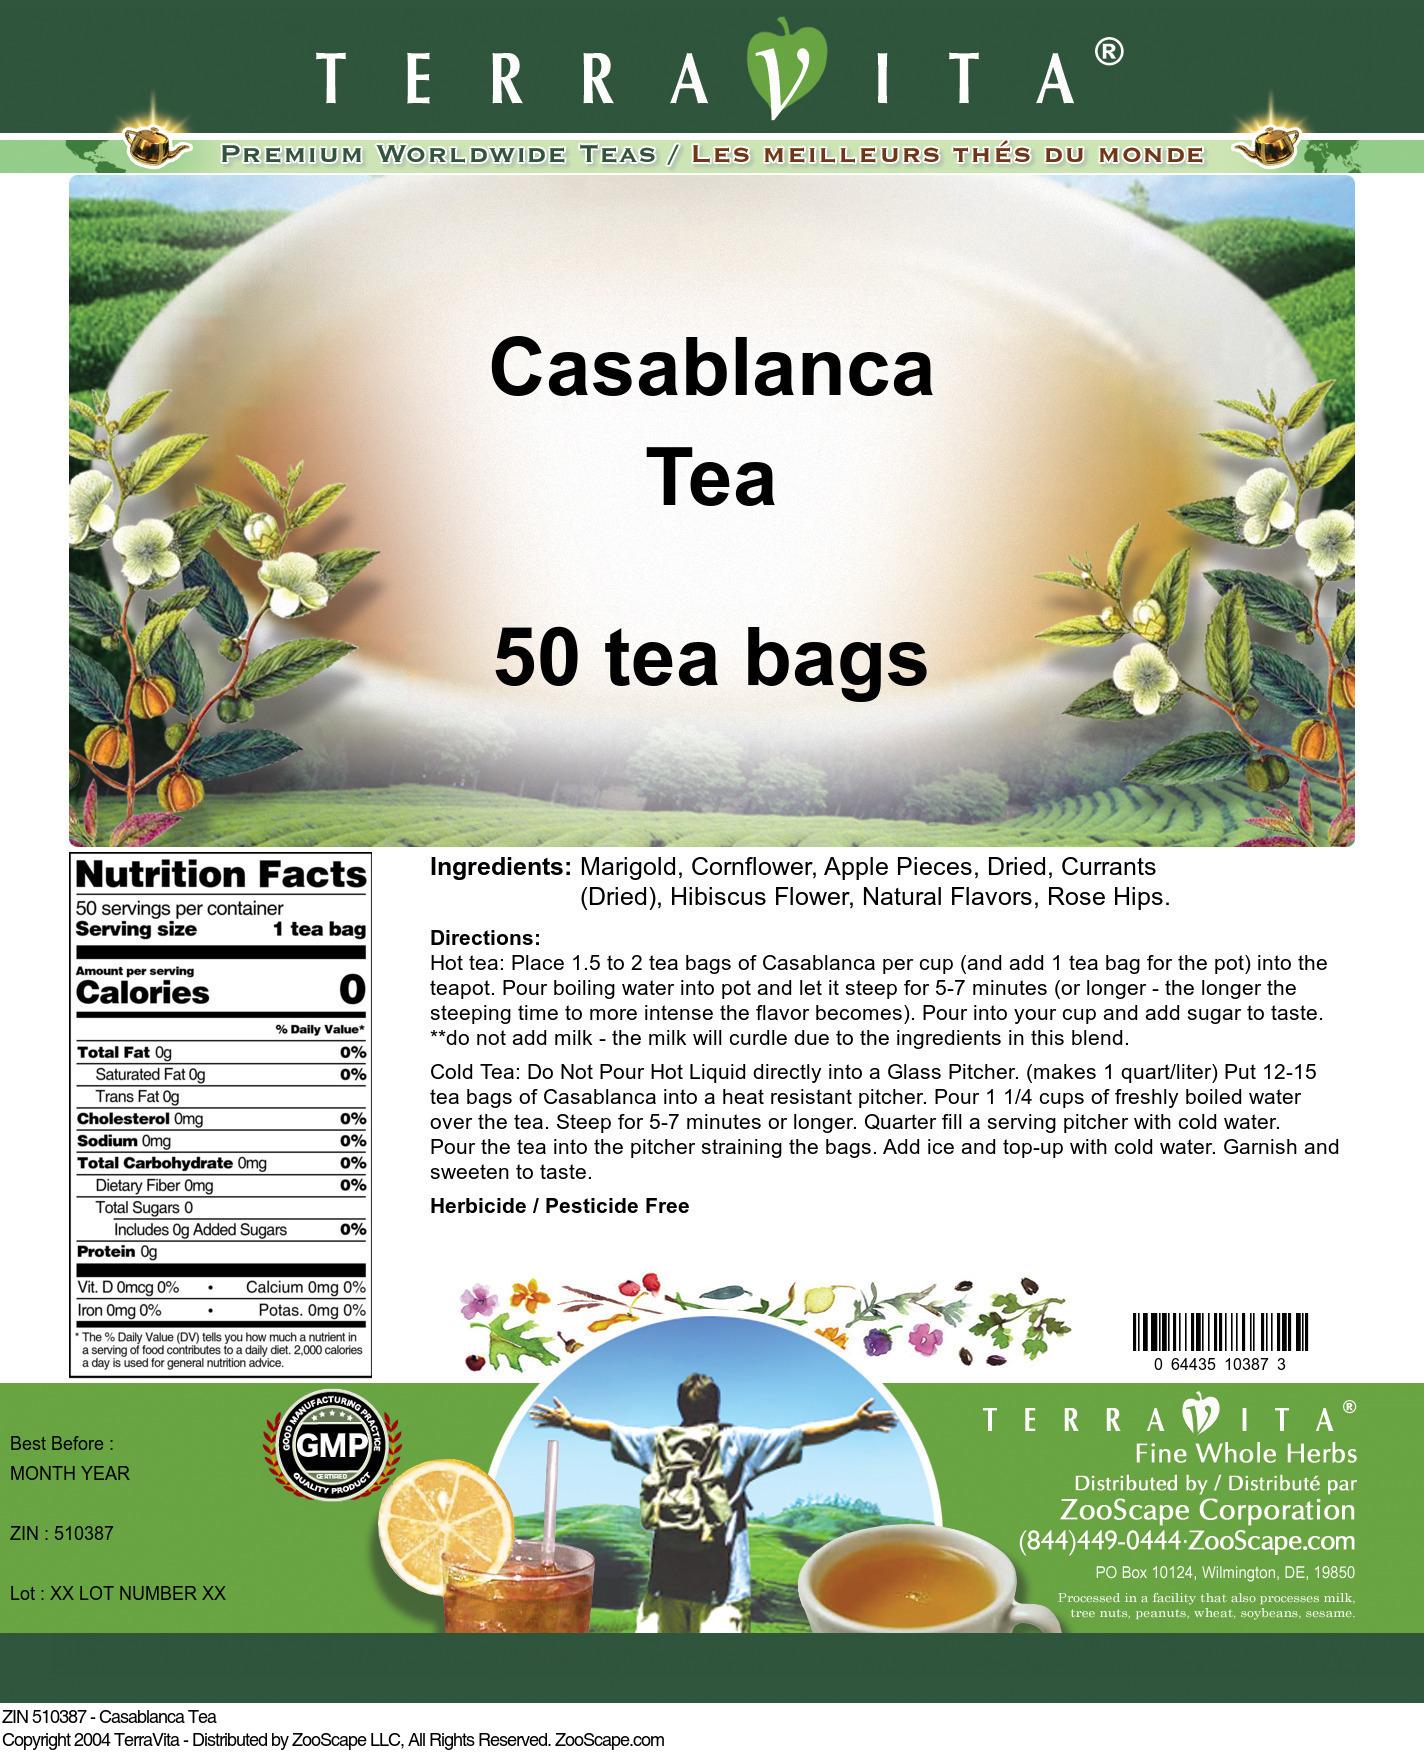 Casablanca Tea